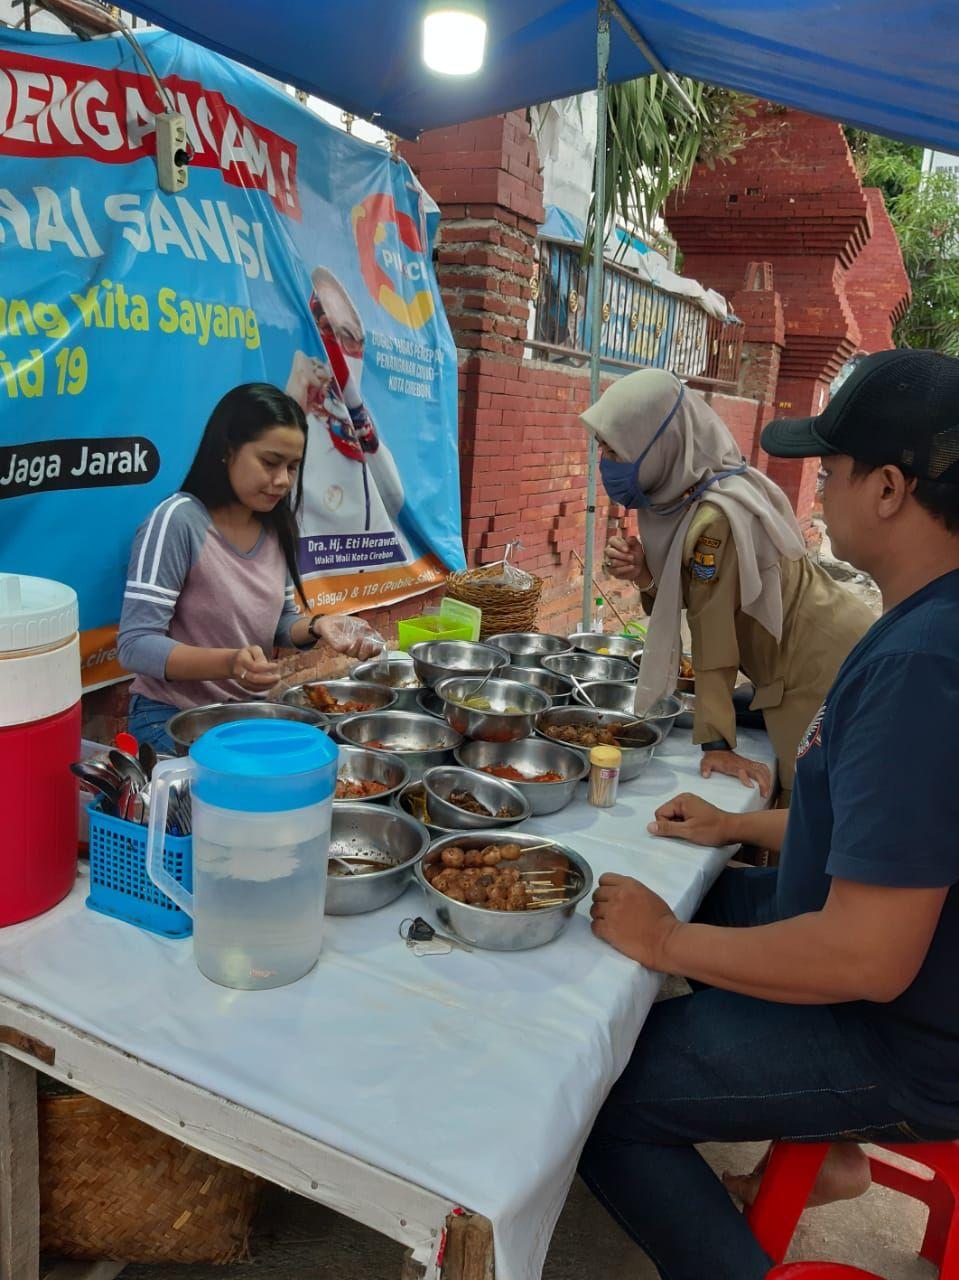 Penjual Nasi Jamblang Cantik di Cirebon